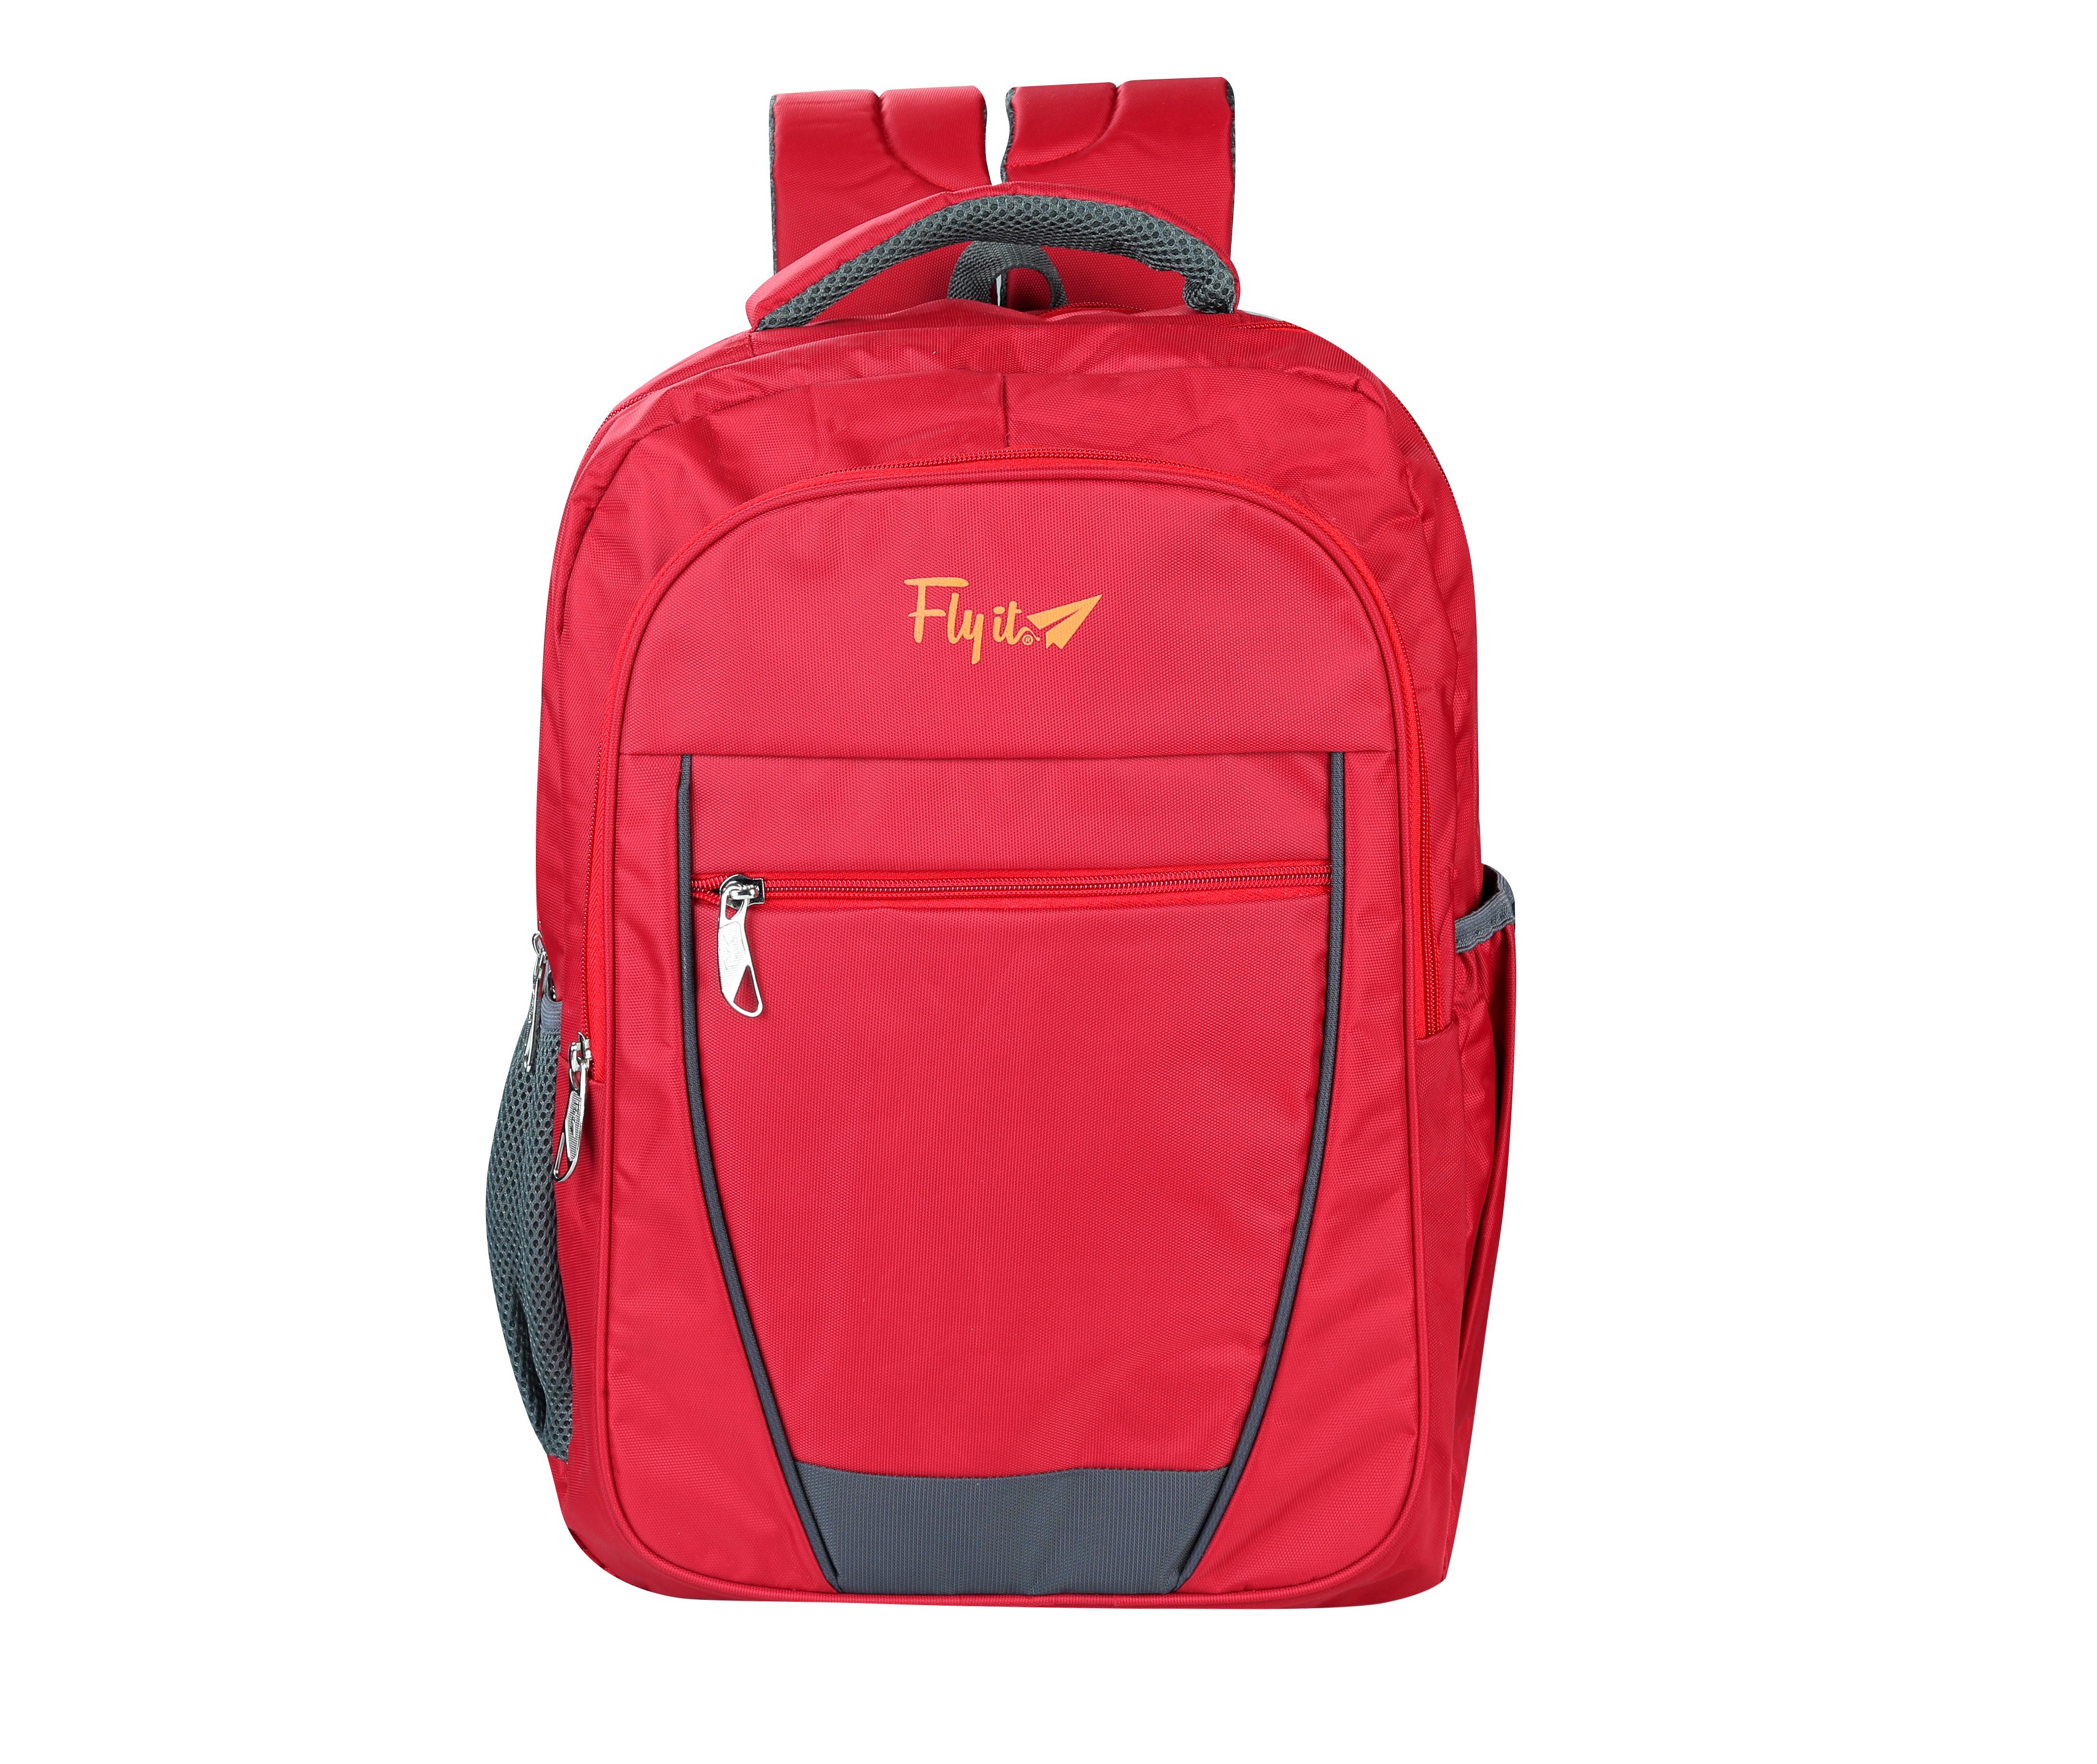 Flyit Trendy Backpack